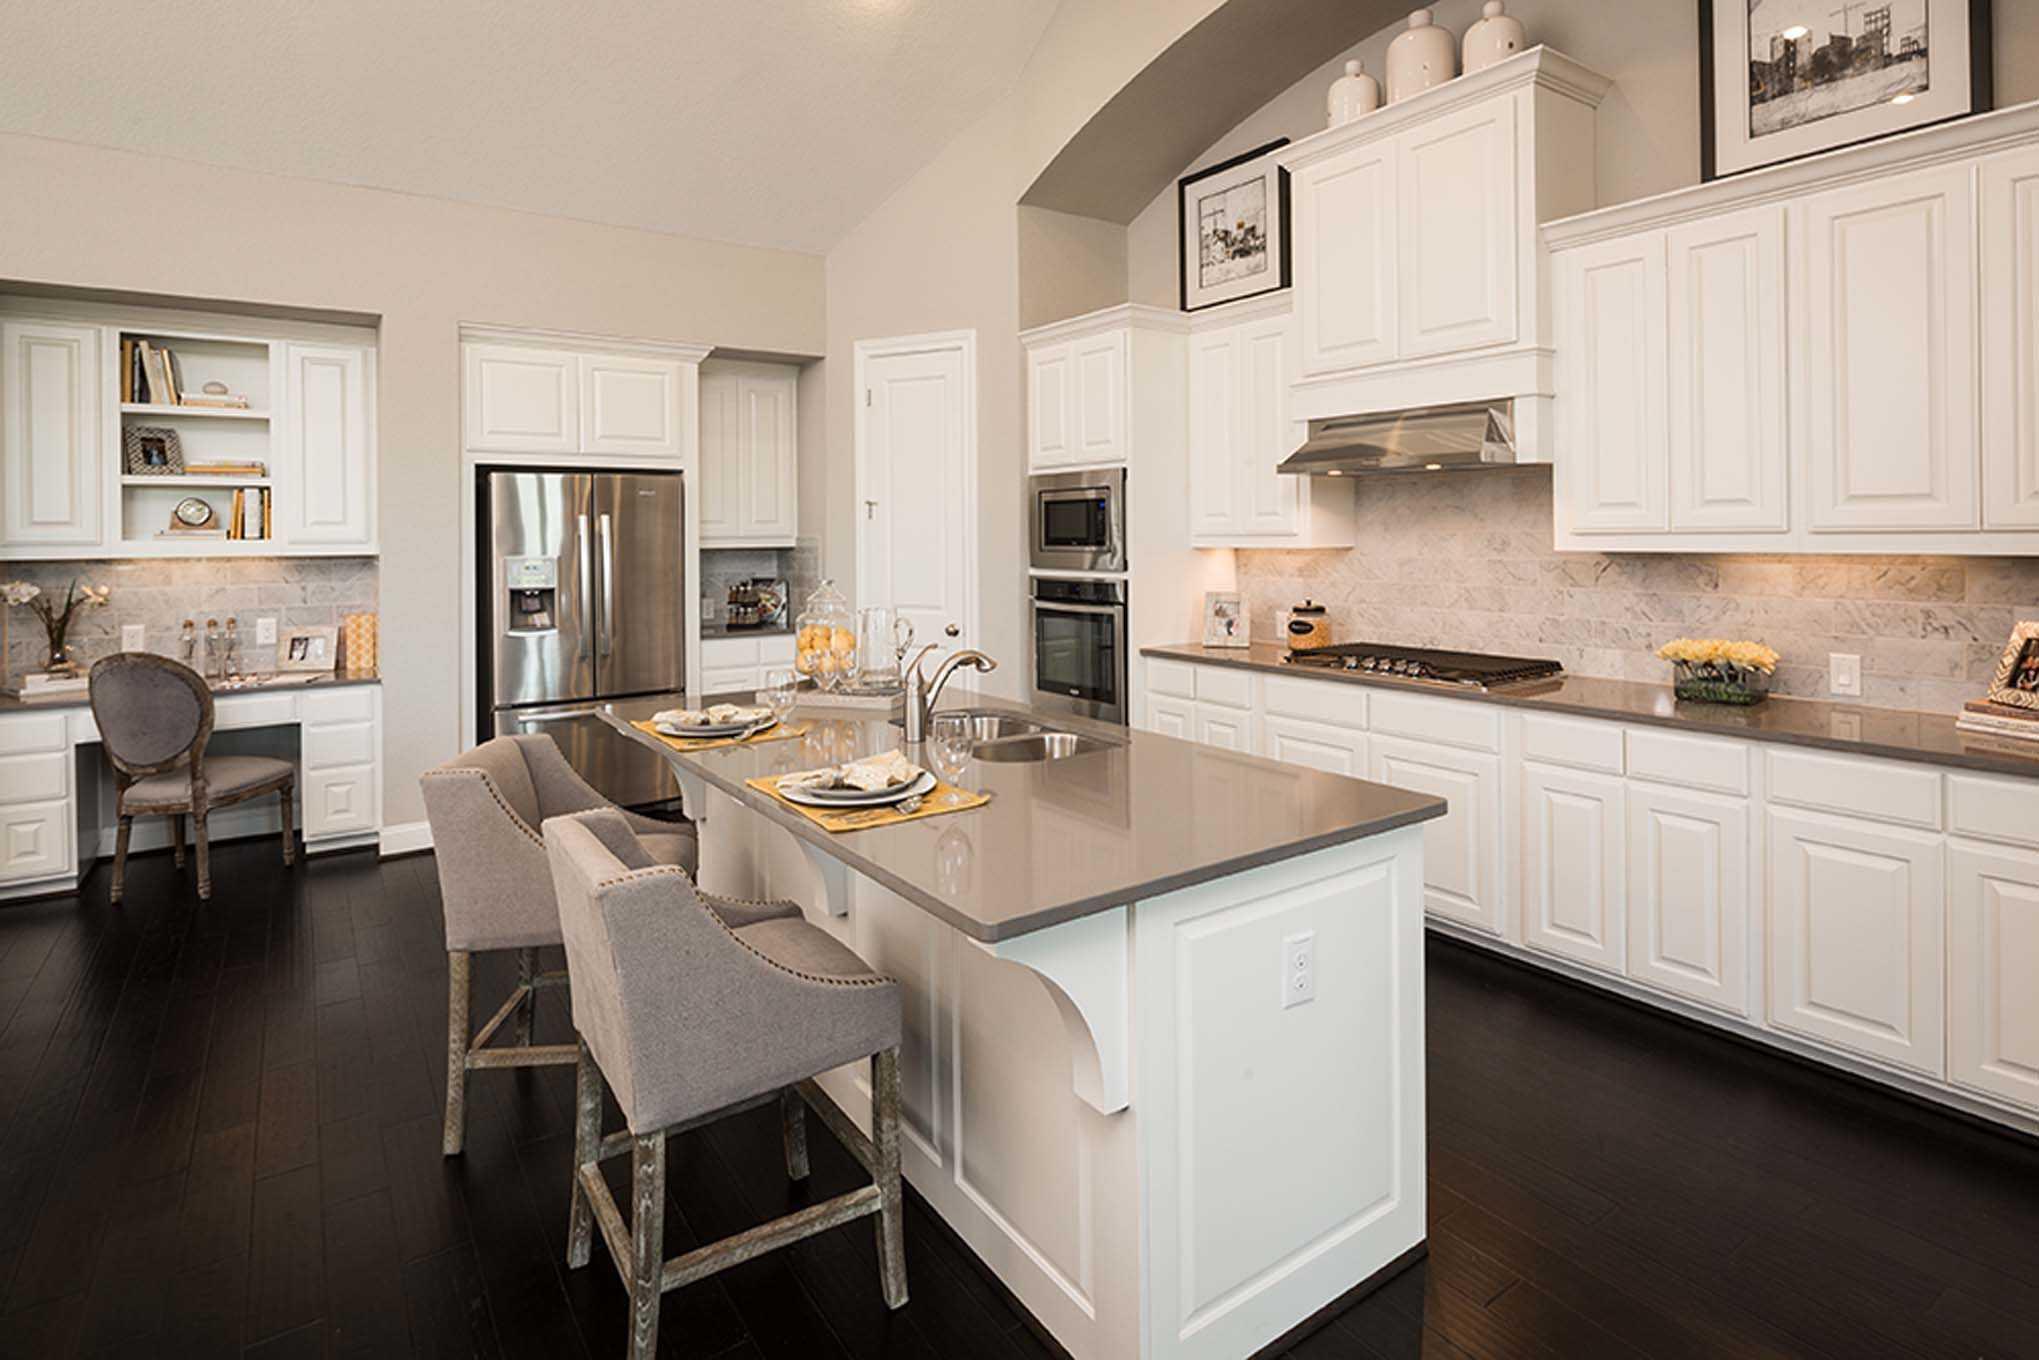 Kitchen-in-Plan 262-at-Star Trail: 86ft. lots-in-Prosper